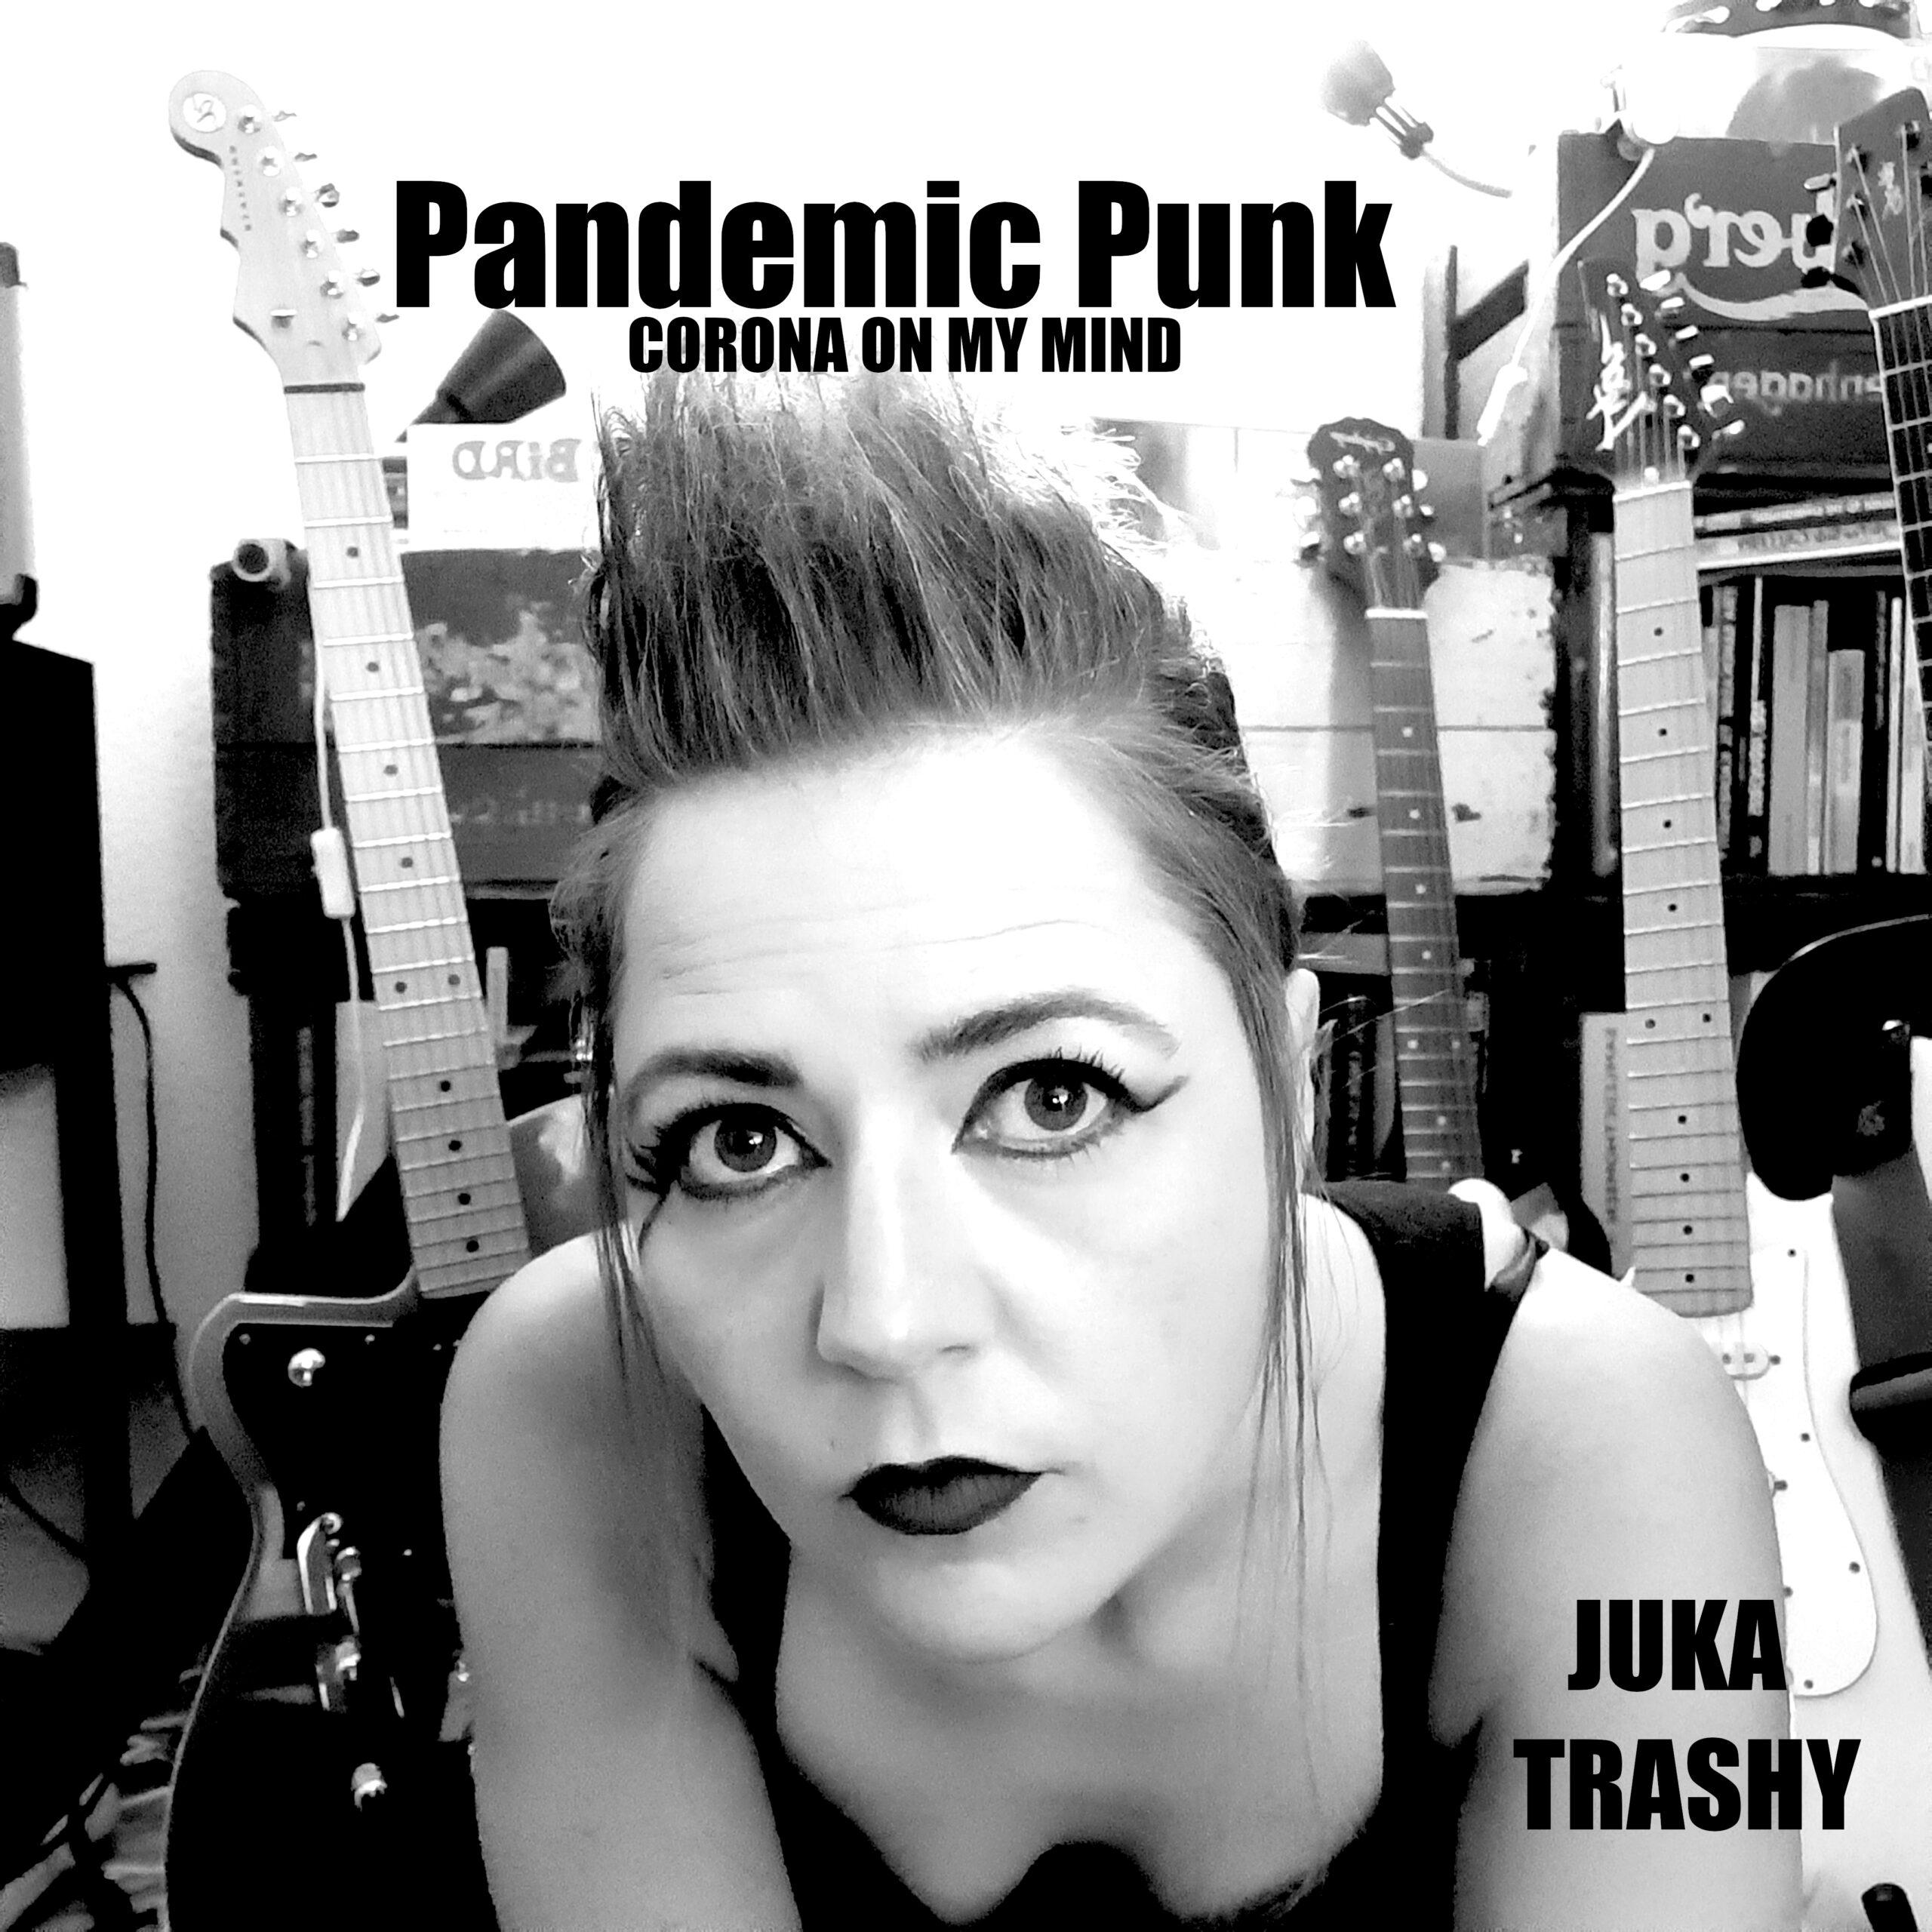 Pandemic Punk Lyrics out now!